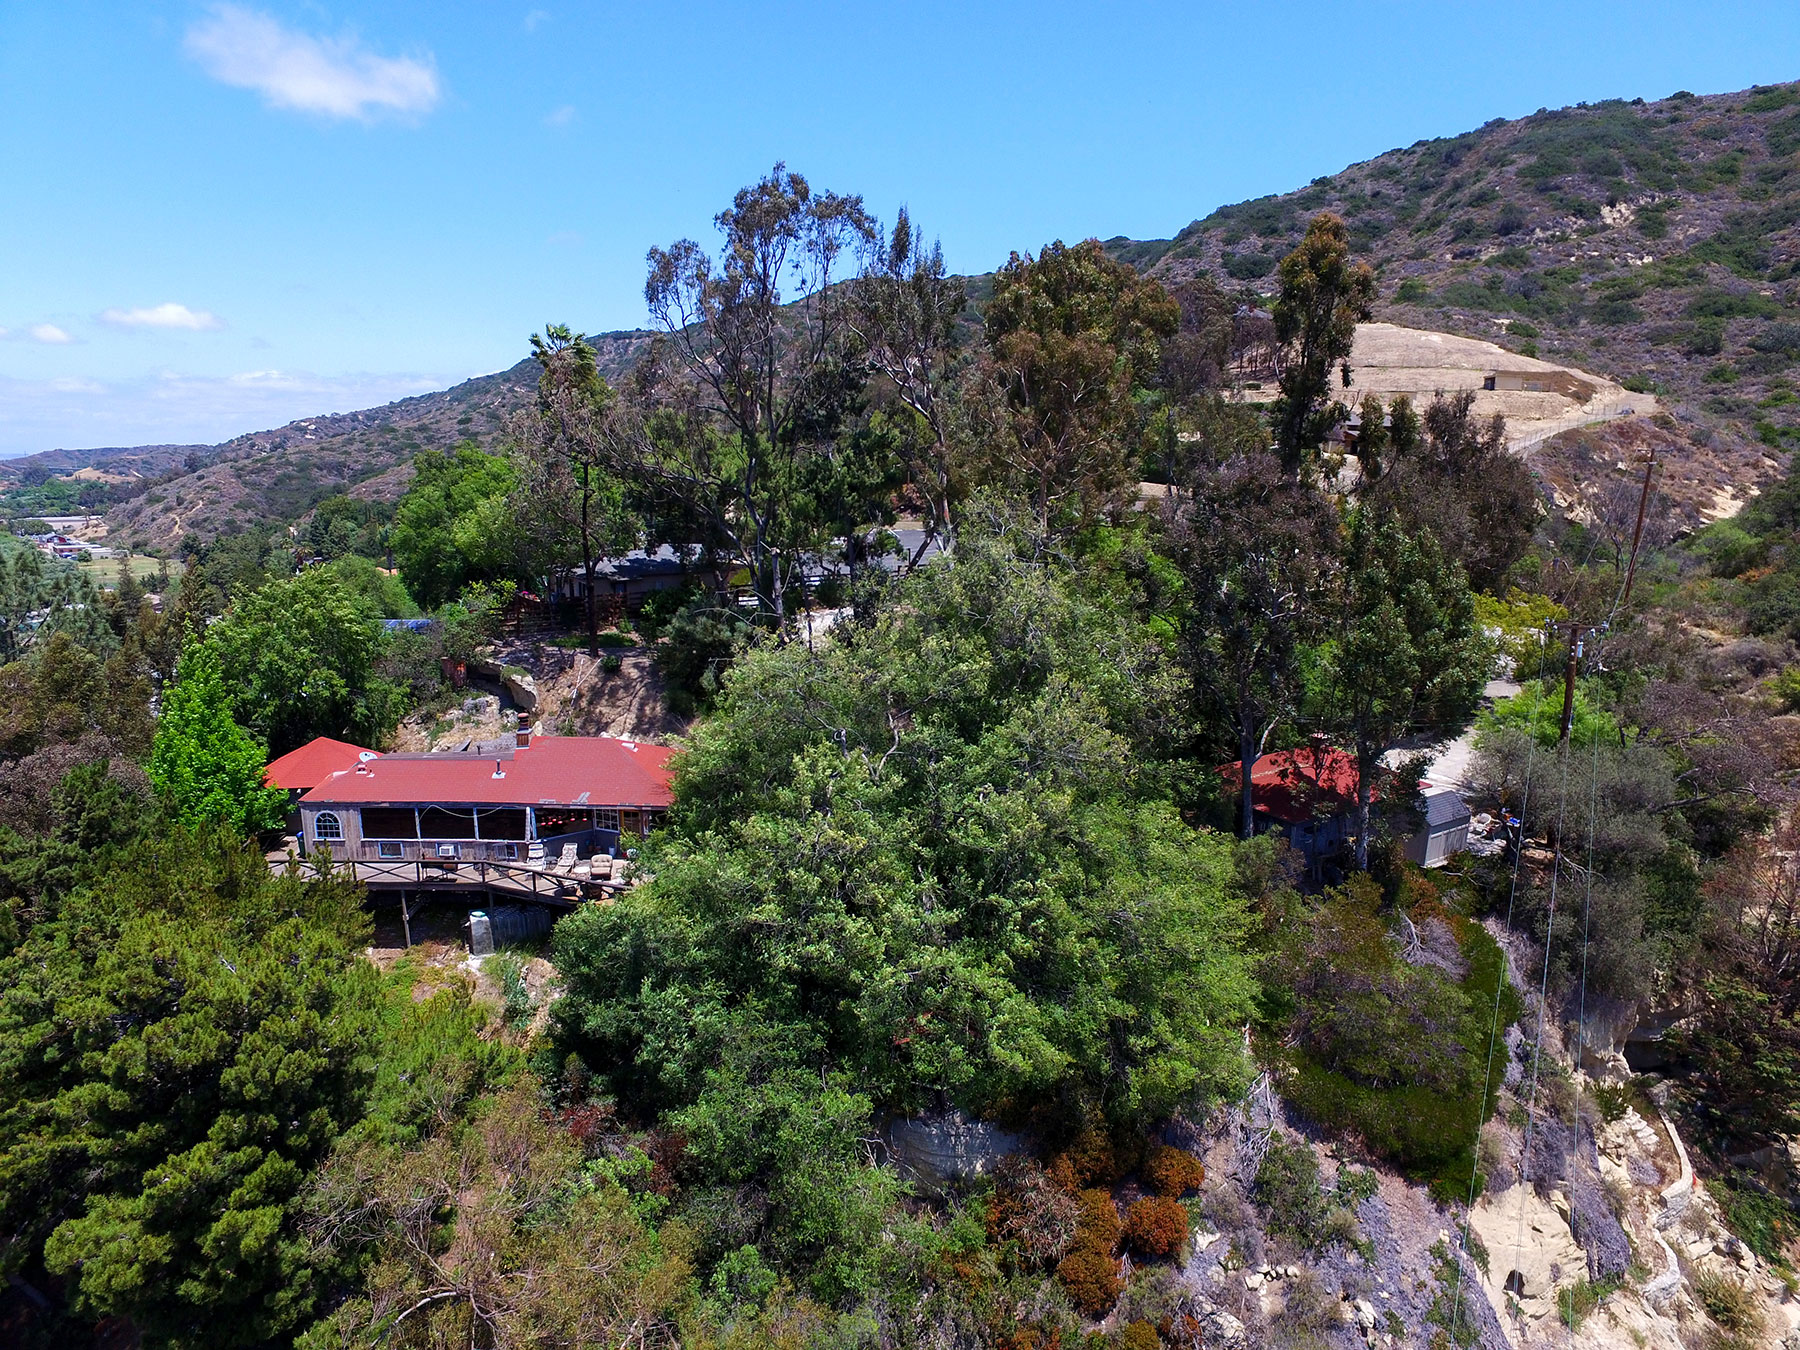 Single Family Home for Sale at 20950 Laguna Canyon Road Laguna Beach, California, 92651 United States